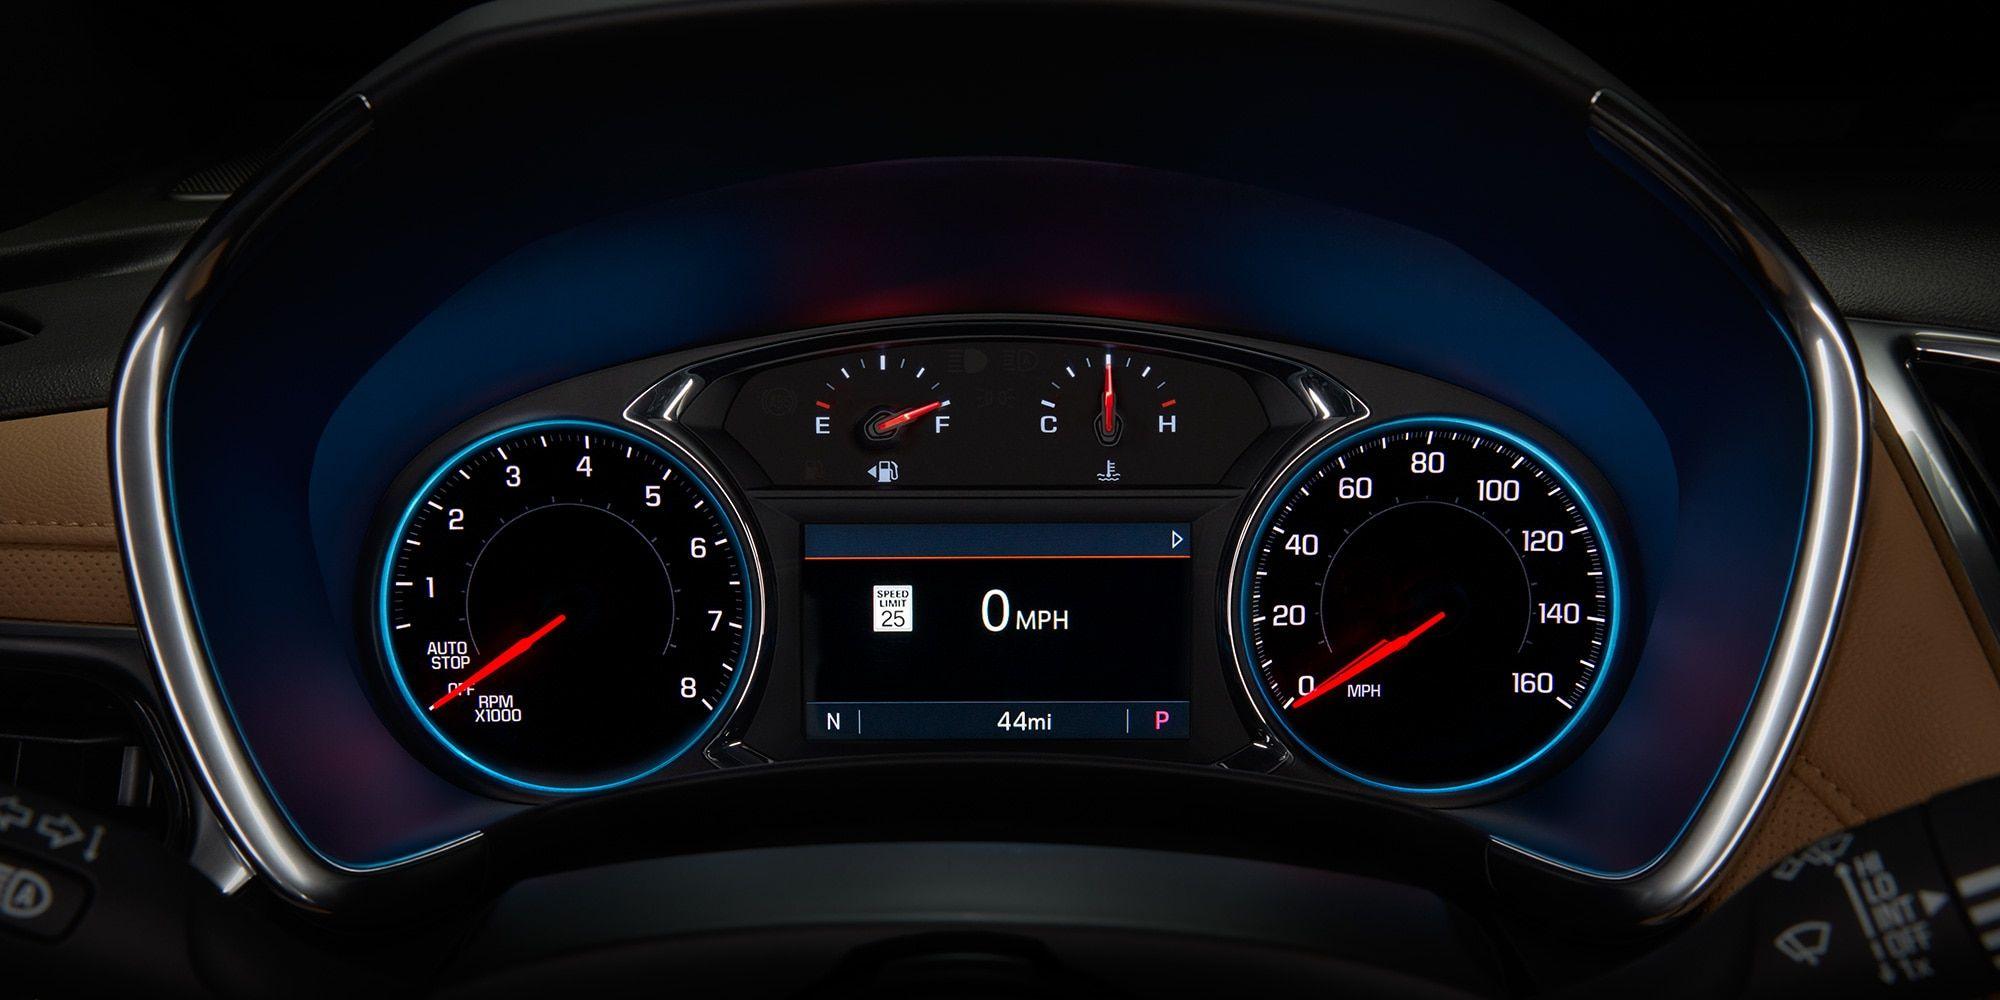 Pin On 2019 Chevrolet Equinox